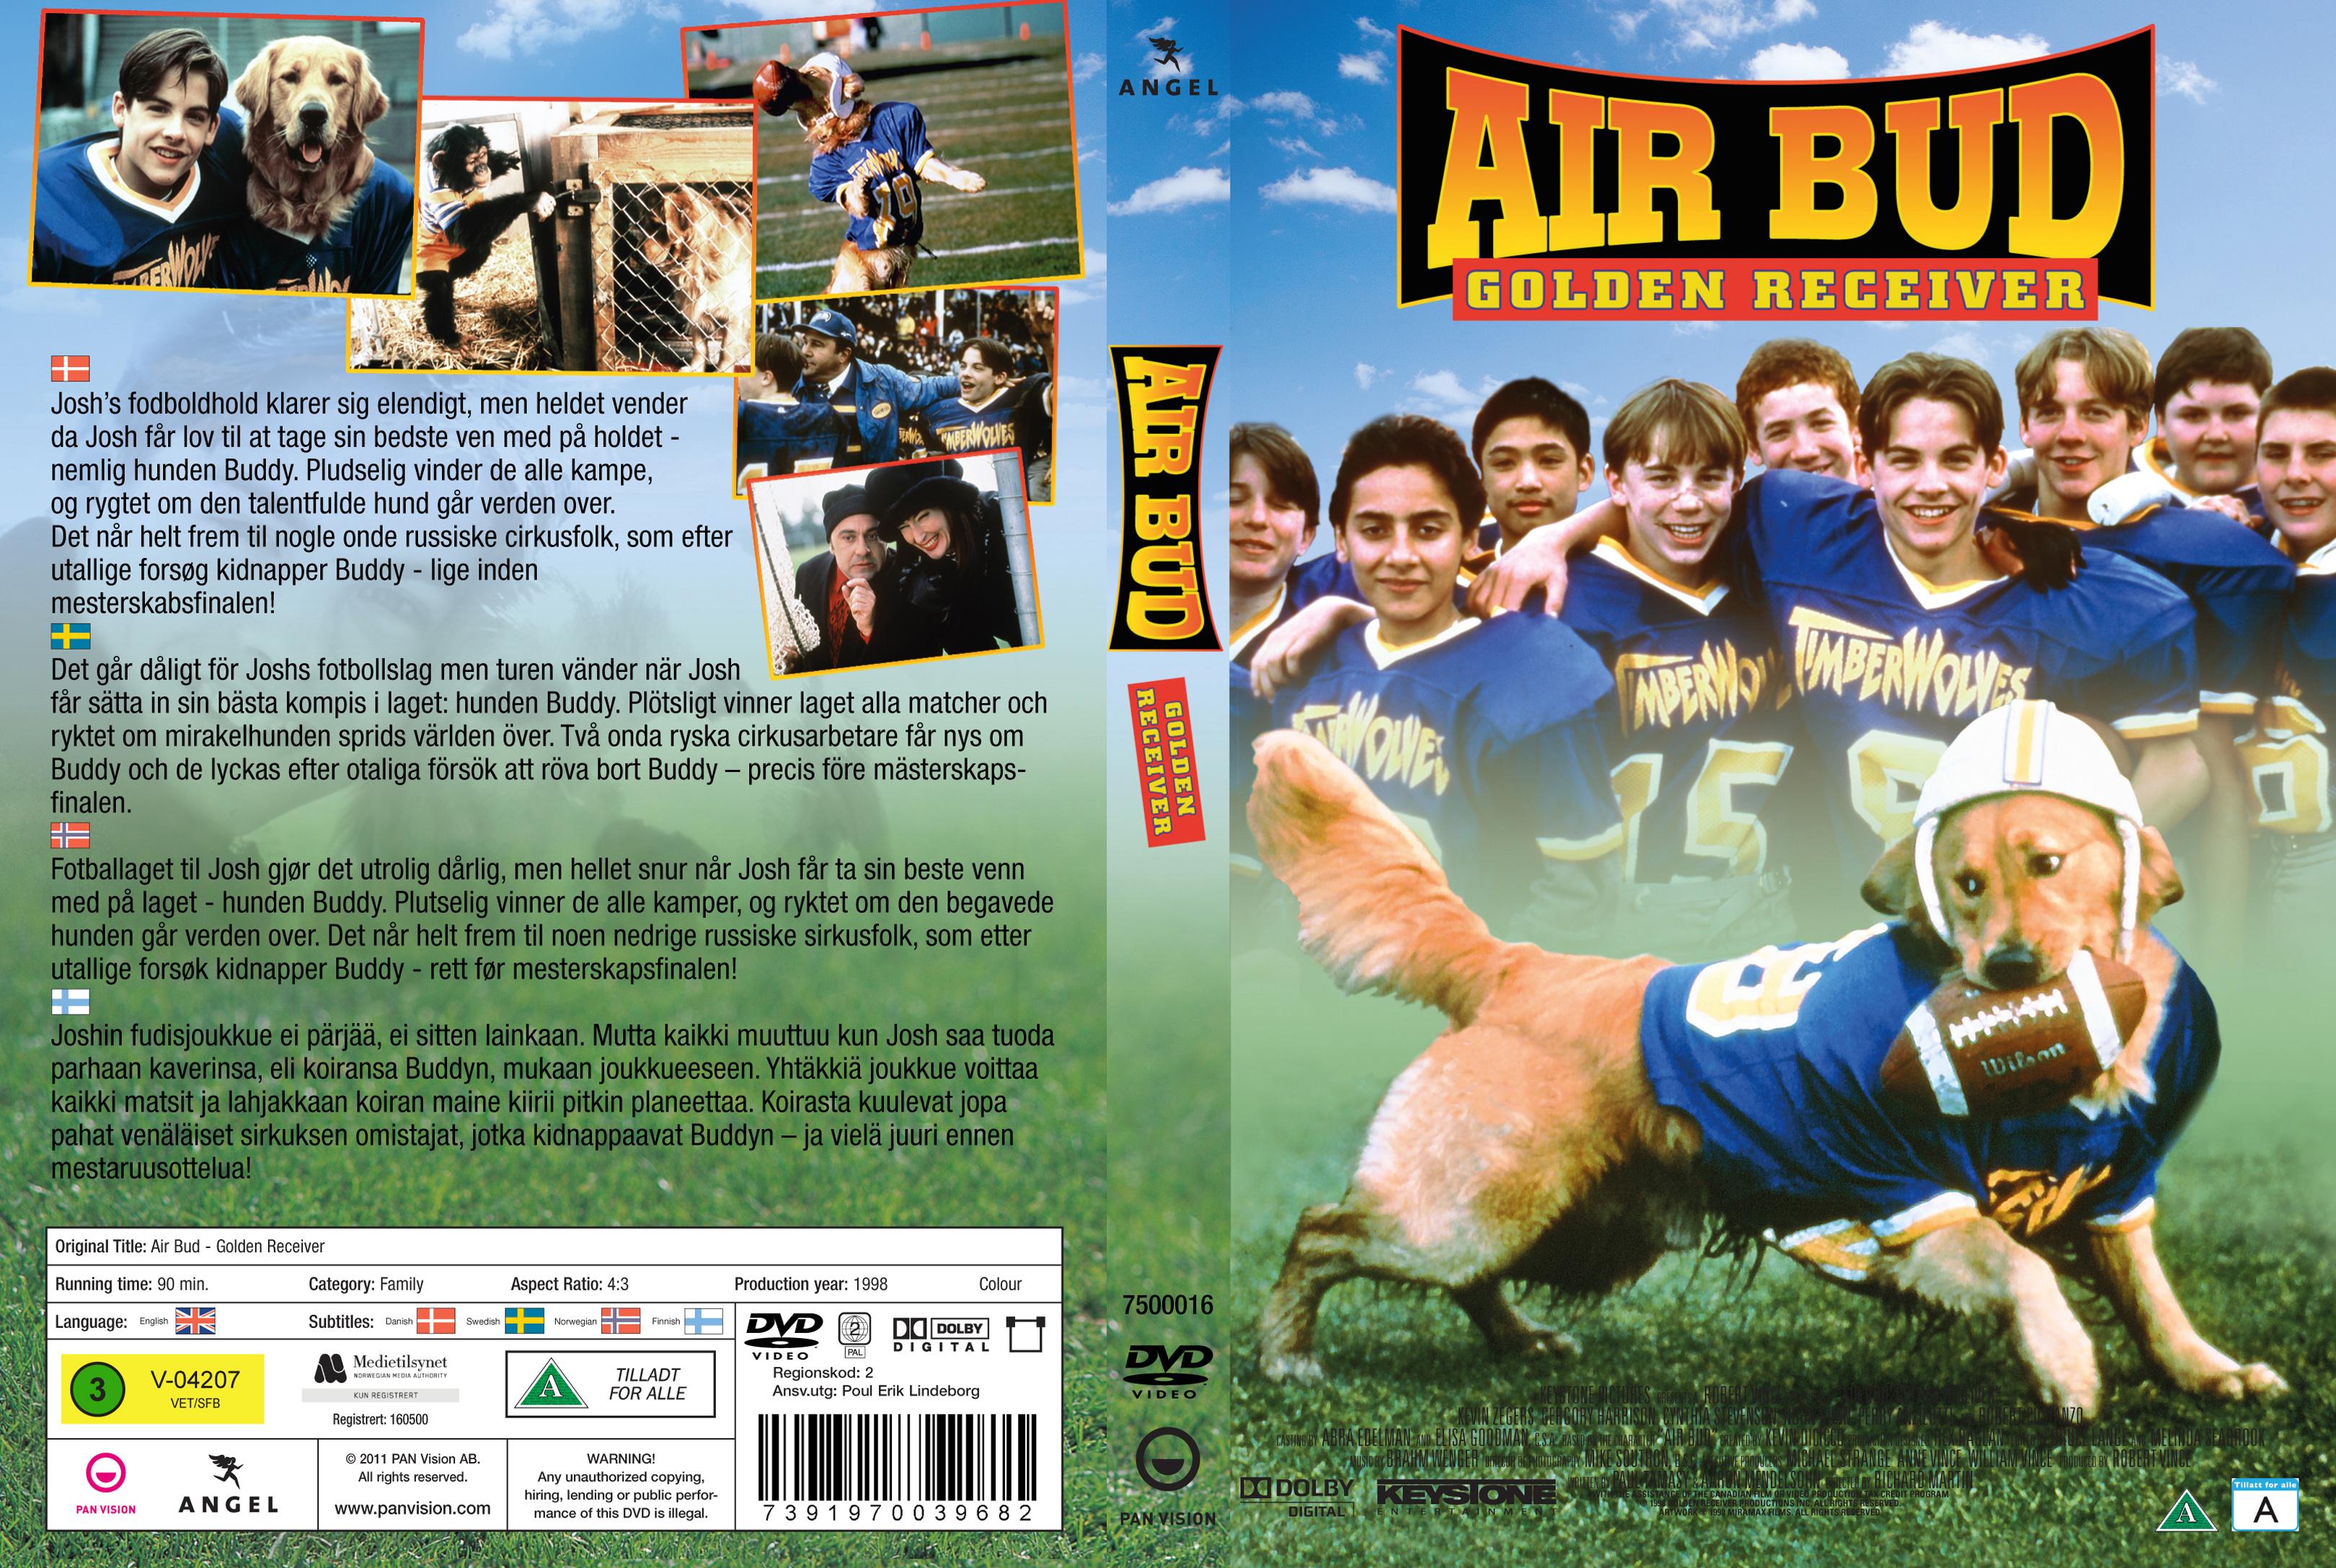 air bud 2 titre original air bud golden receiver air bud goldenAir Bud Football Josh